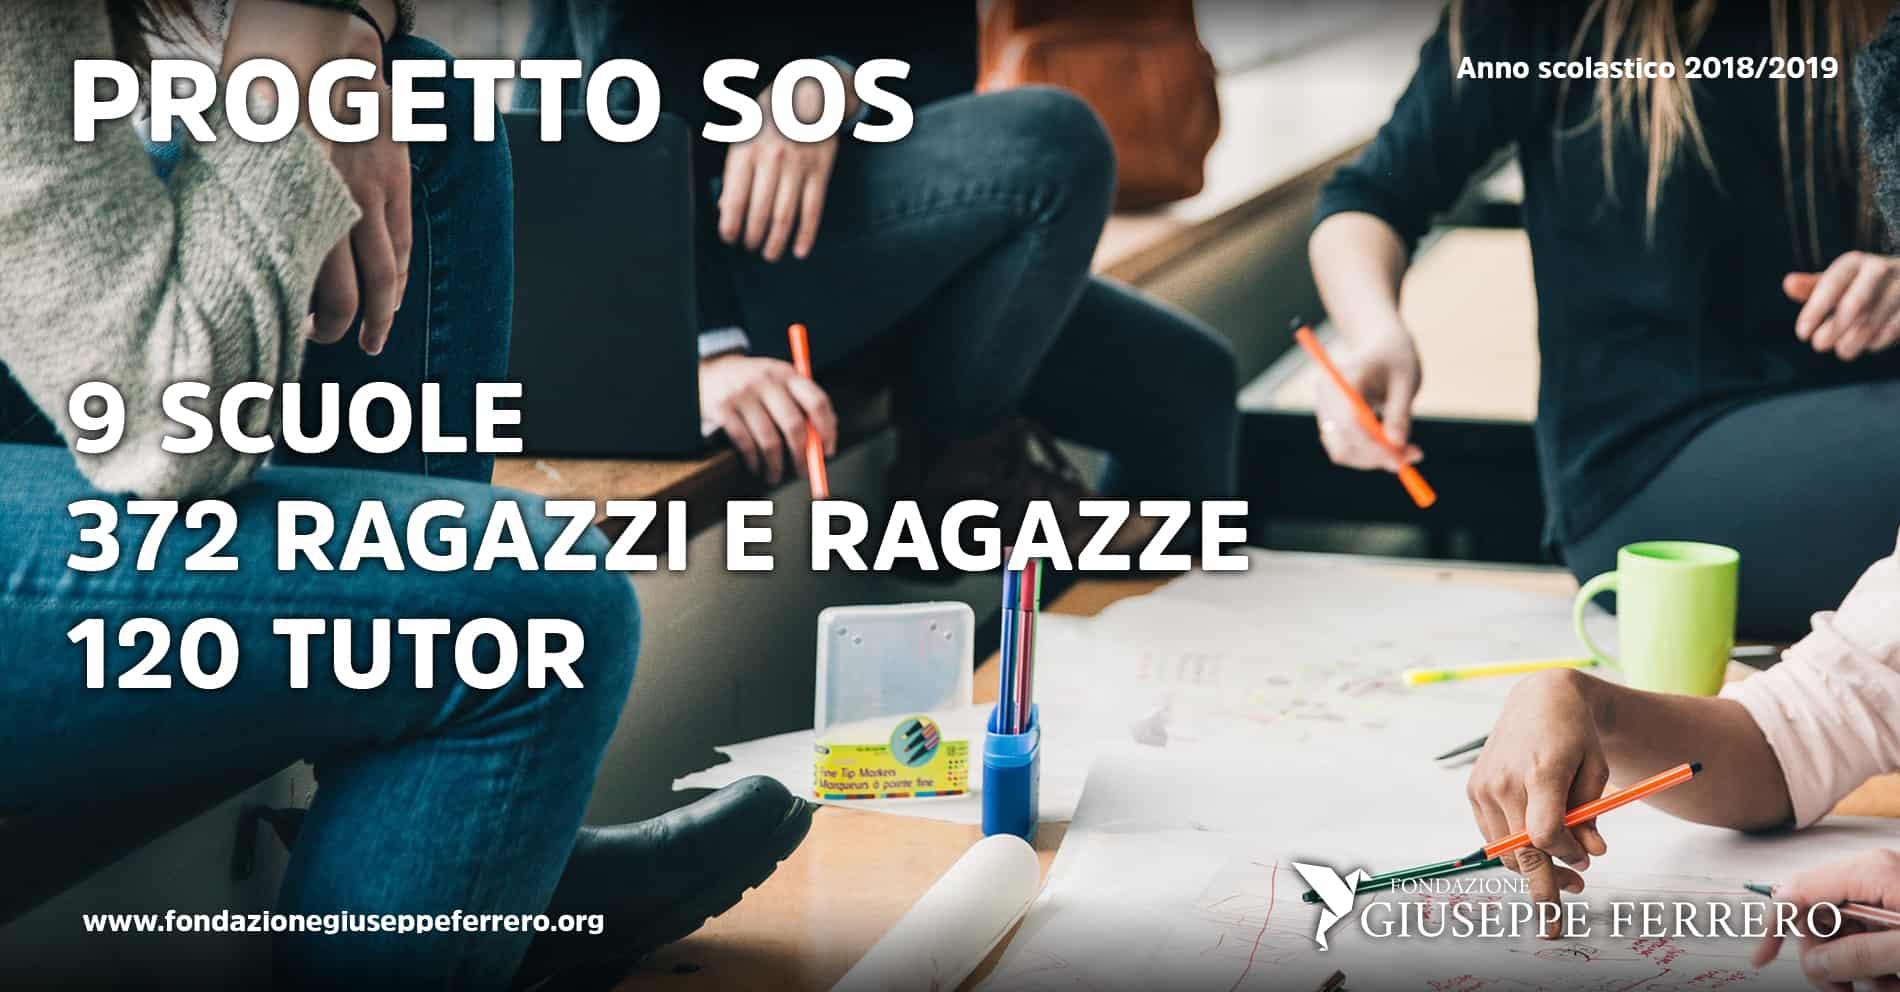 Progetto SOS